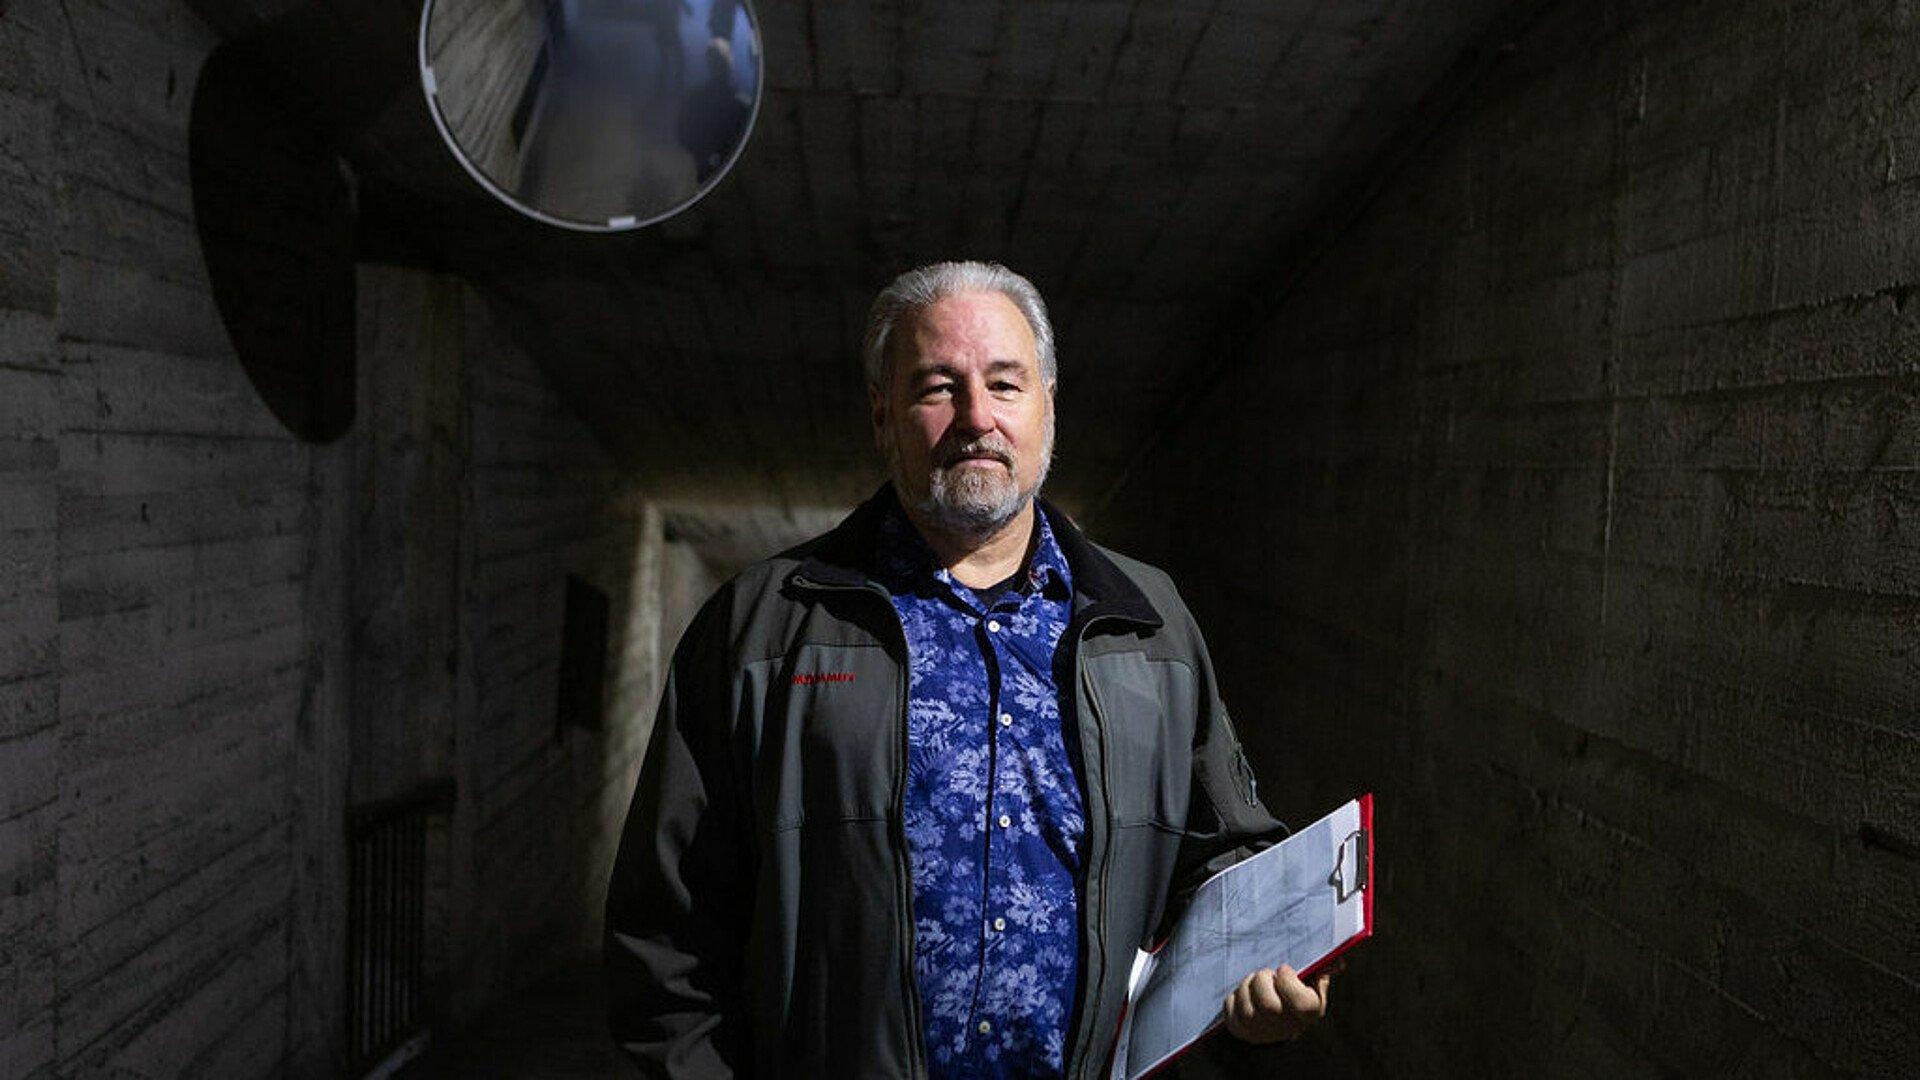 Robert Schwienbacher im Riphahn-Bunker in Köln